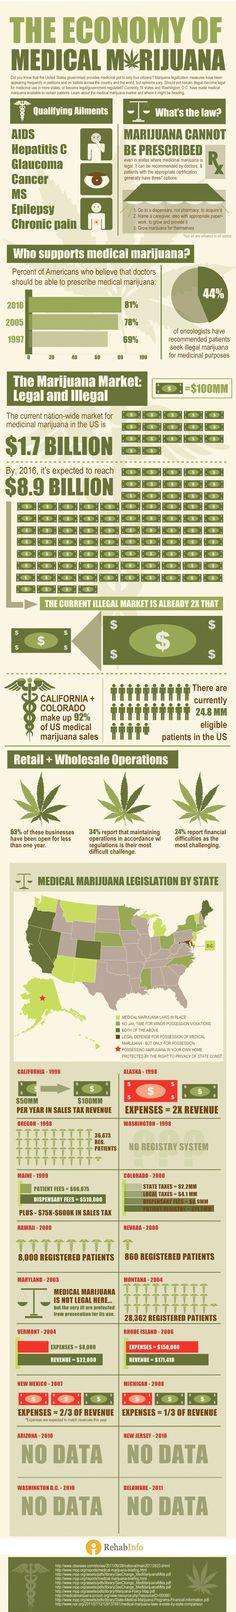 The Economy of Medical Marijuana